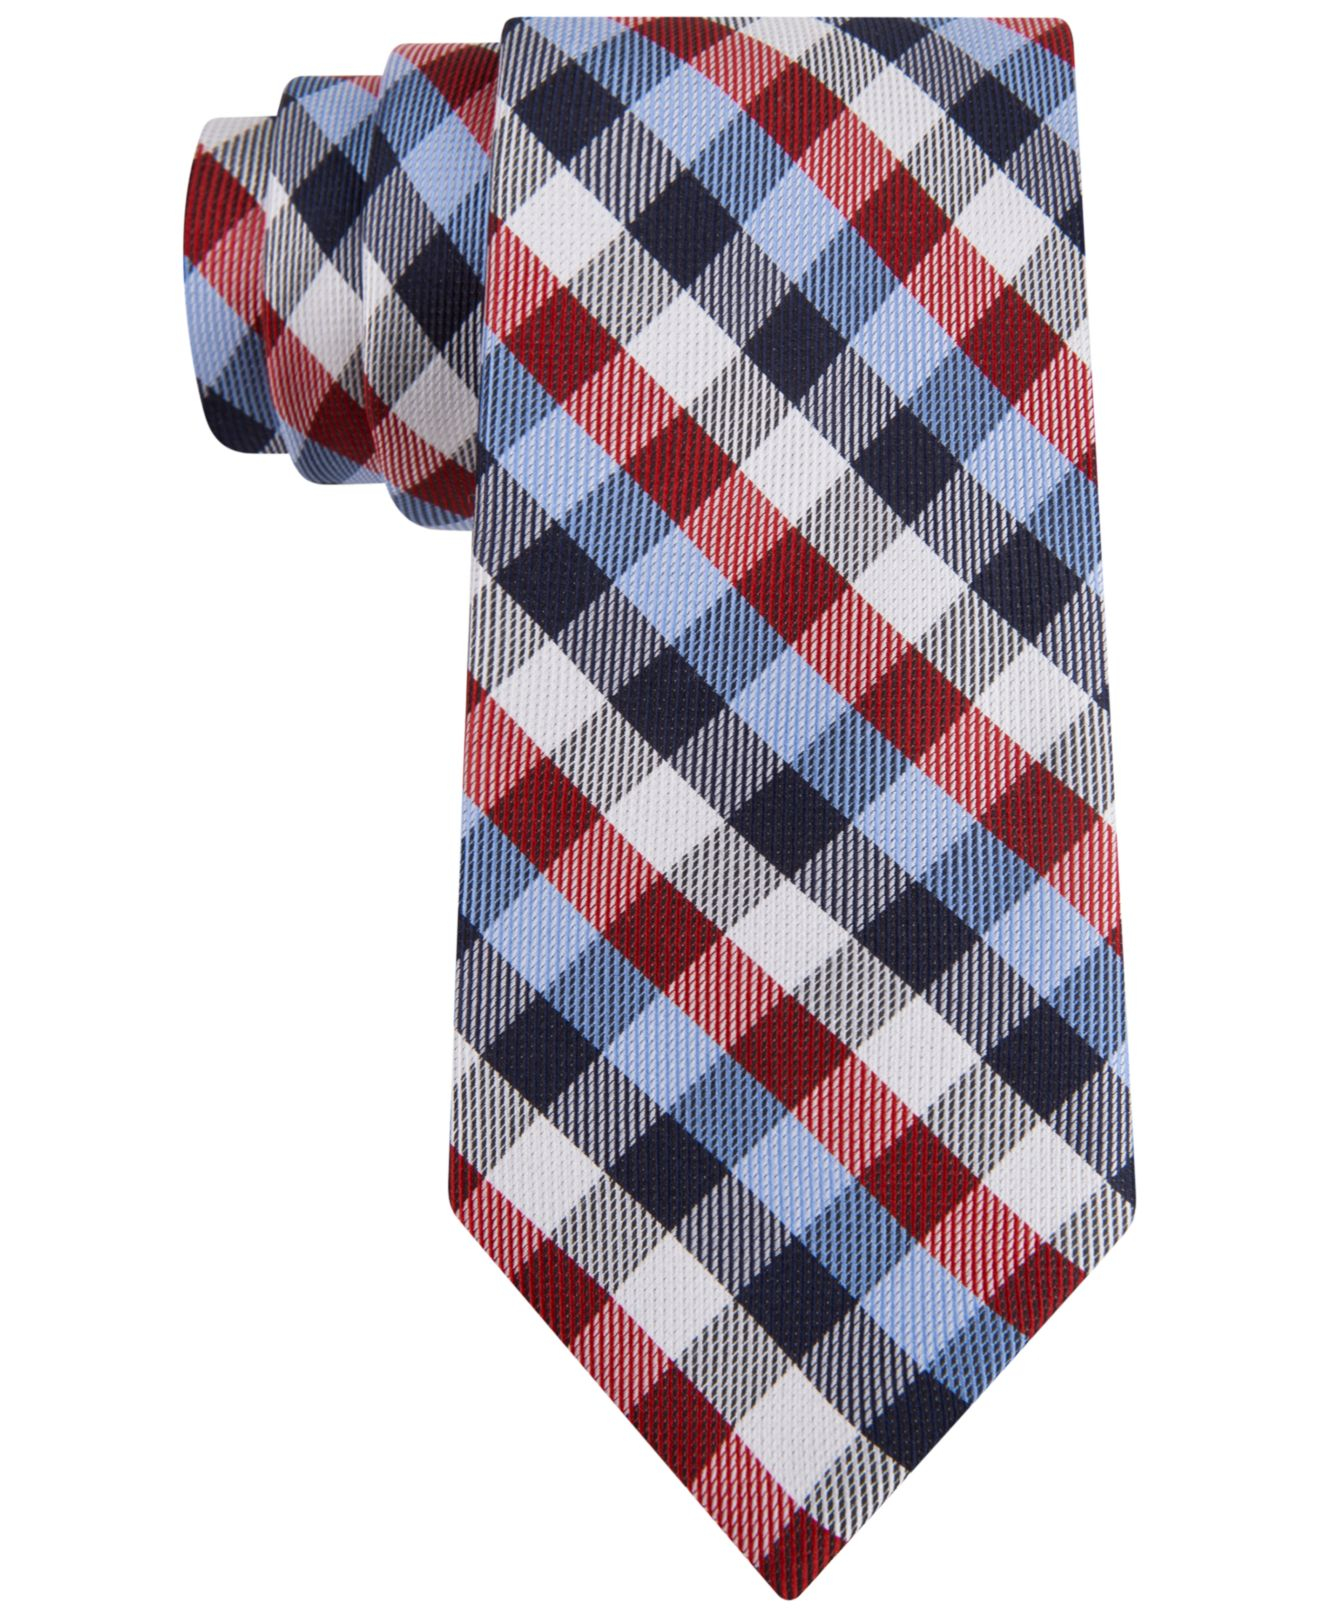 d1494fa49f50 Tommy Hilfiger Multi-gingham Slim Tie in Blue for Men - Lyst